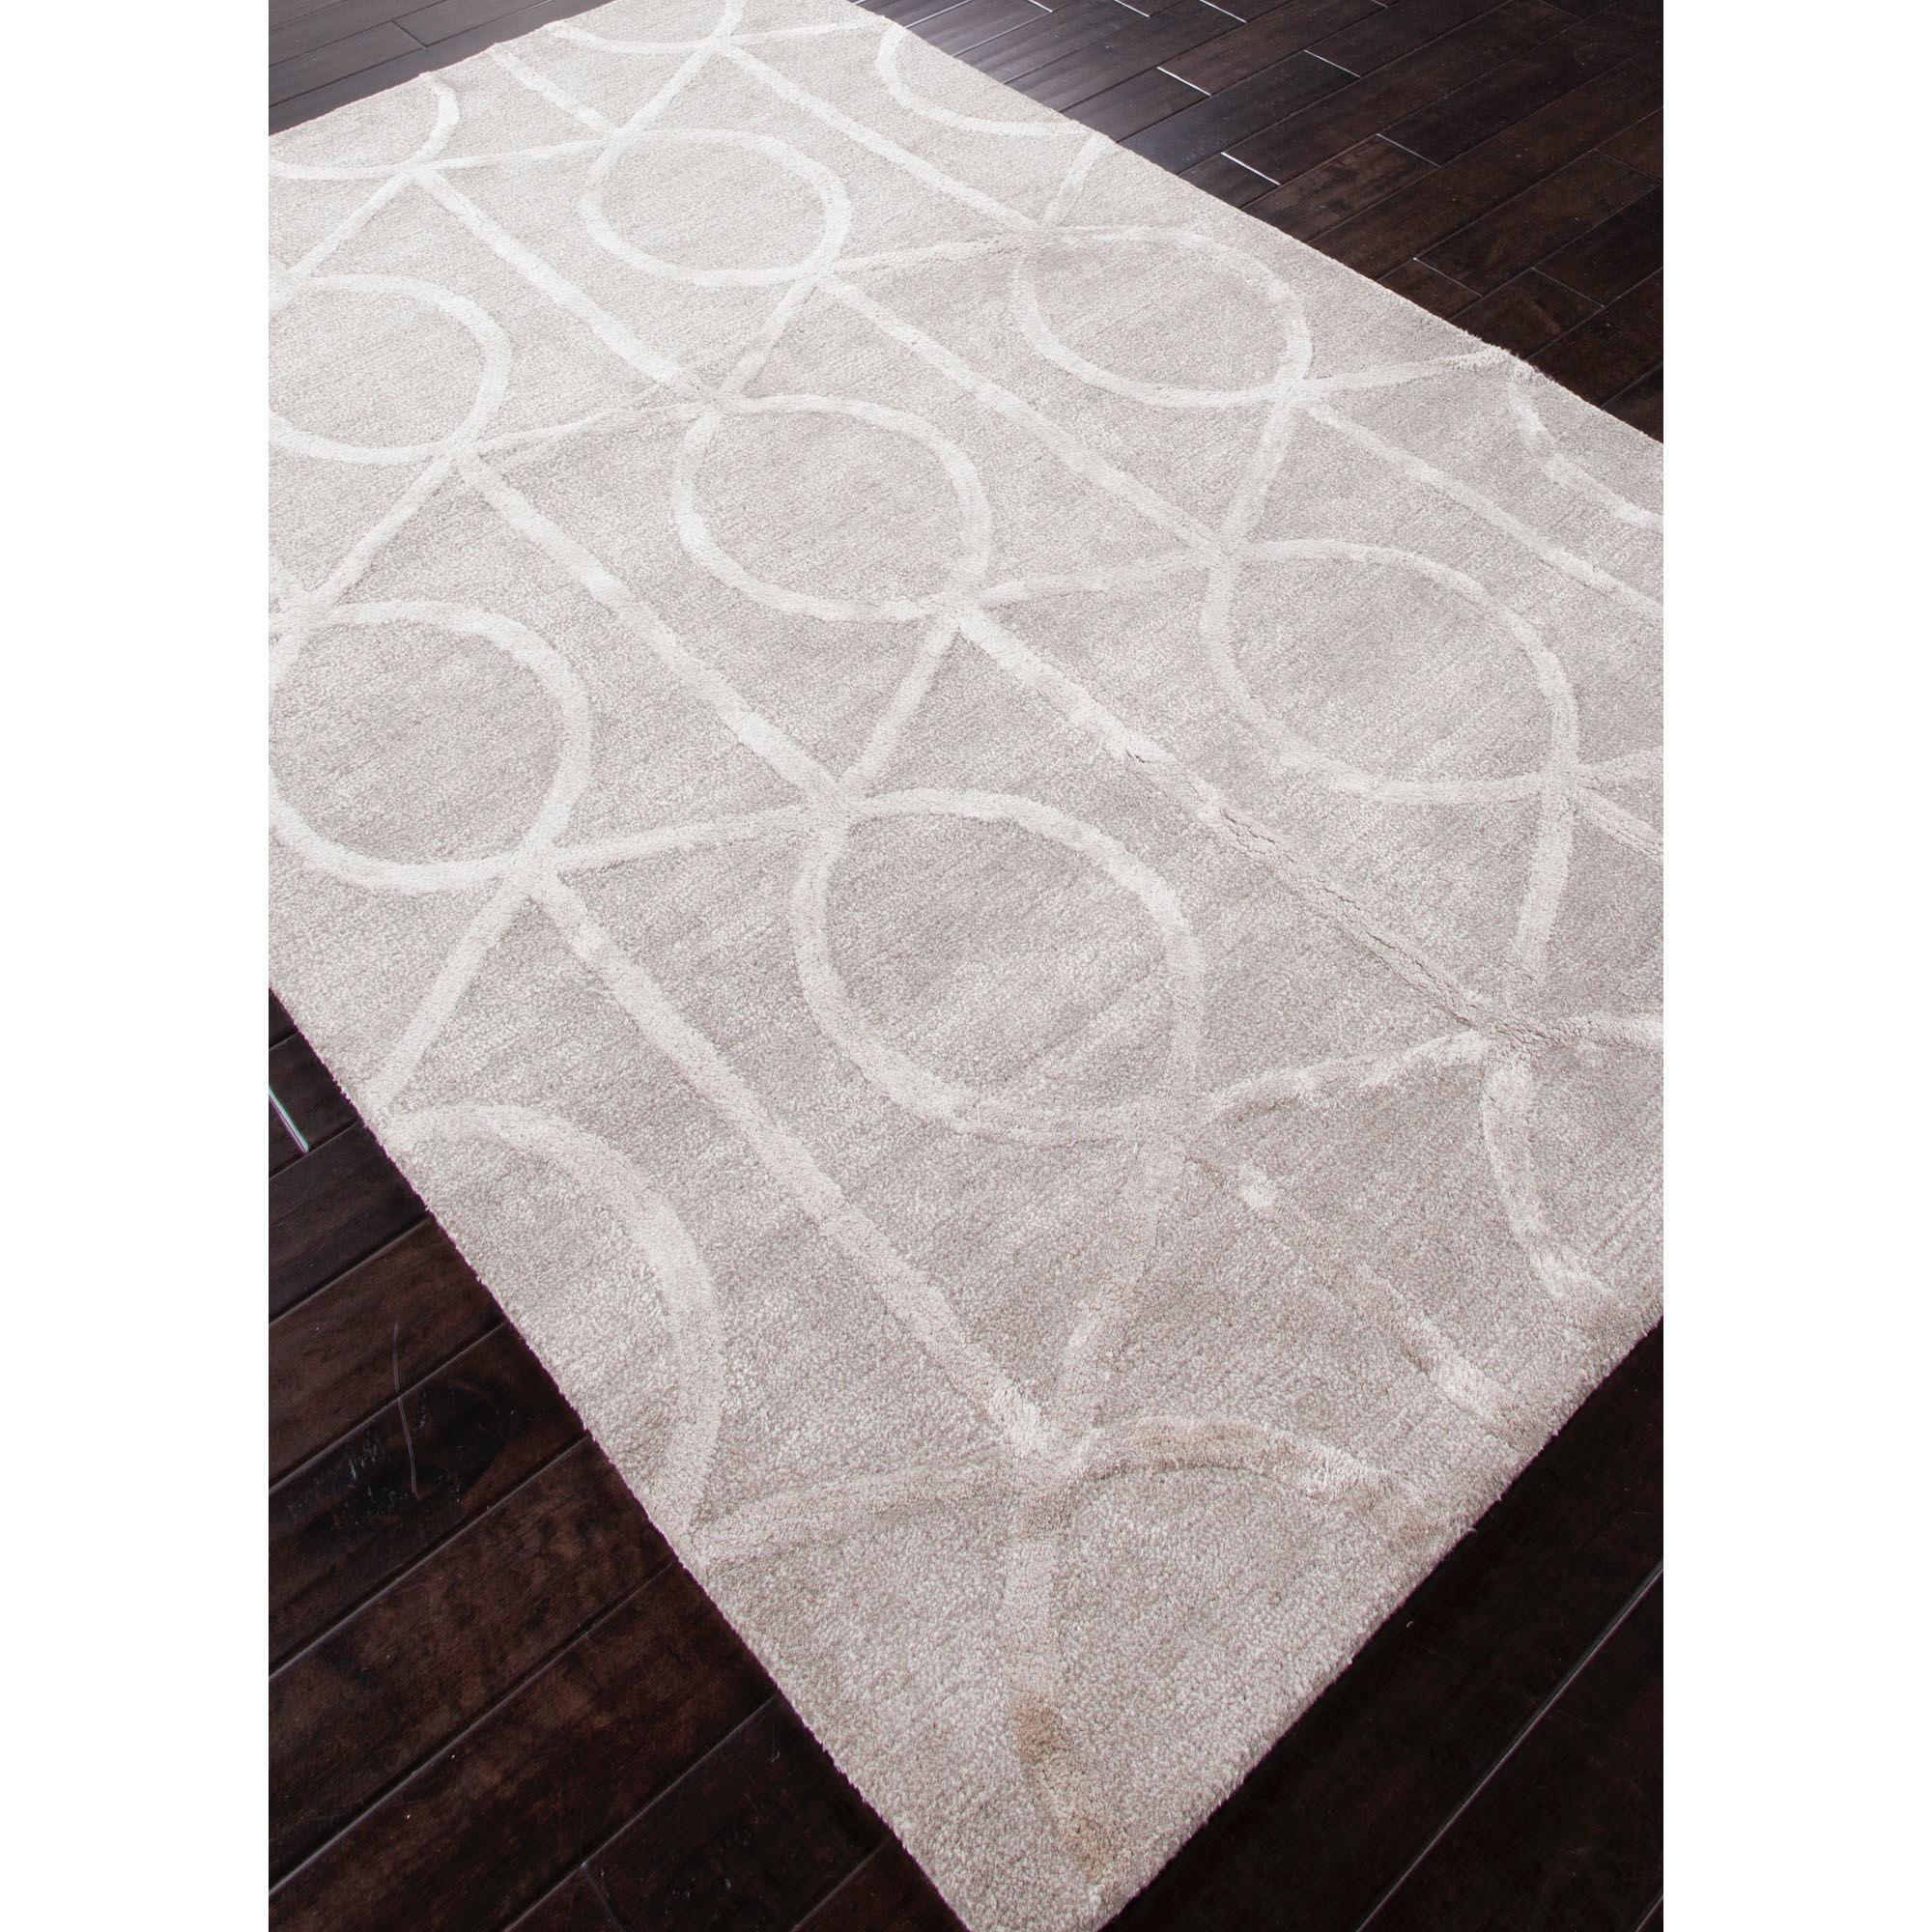 Beautiful Jaipur Rugs Hand Tufted Geometric Pattern Wool/ Art Silk Taupe/